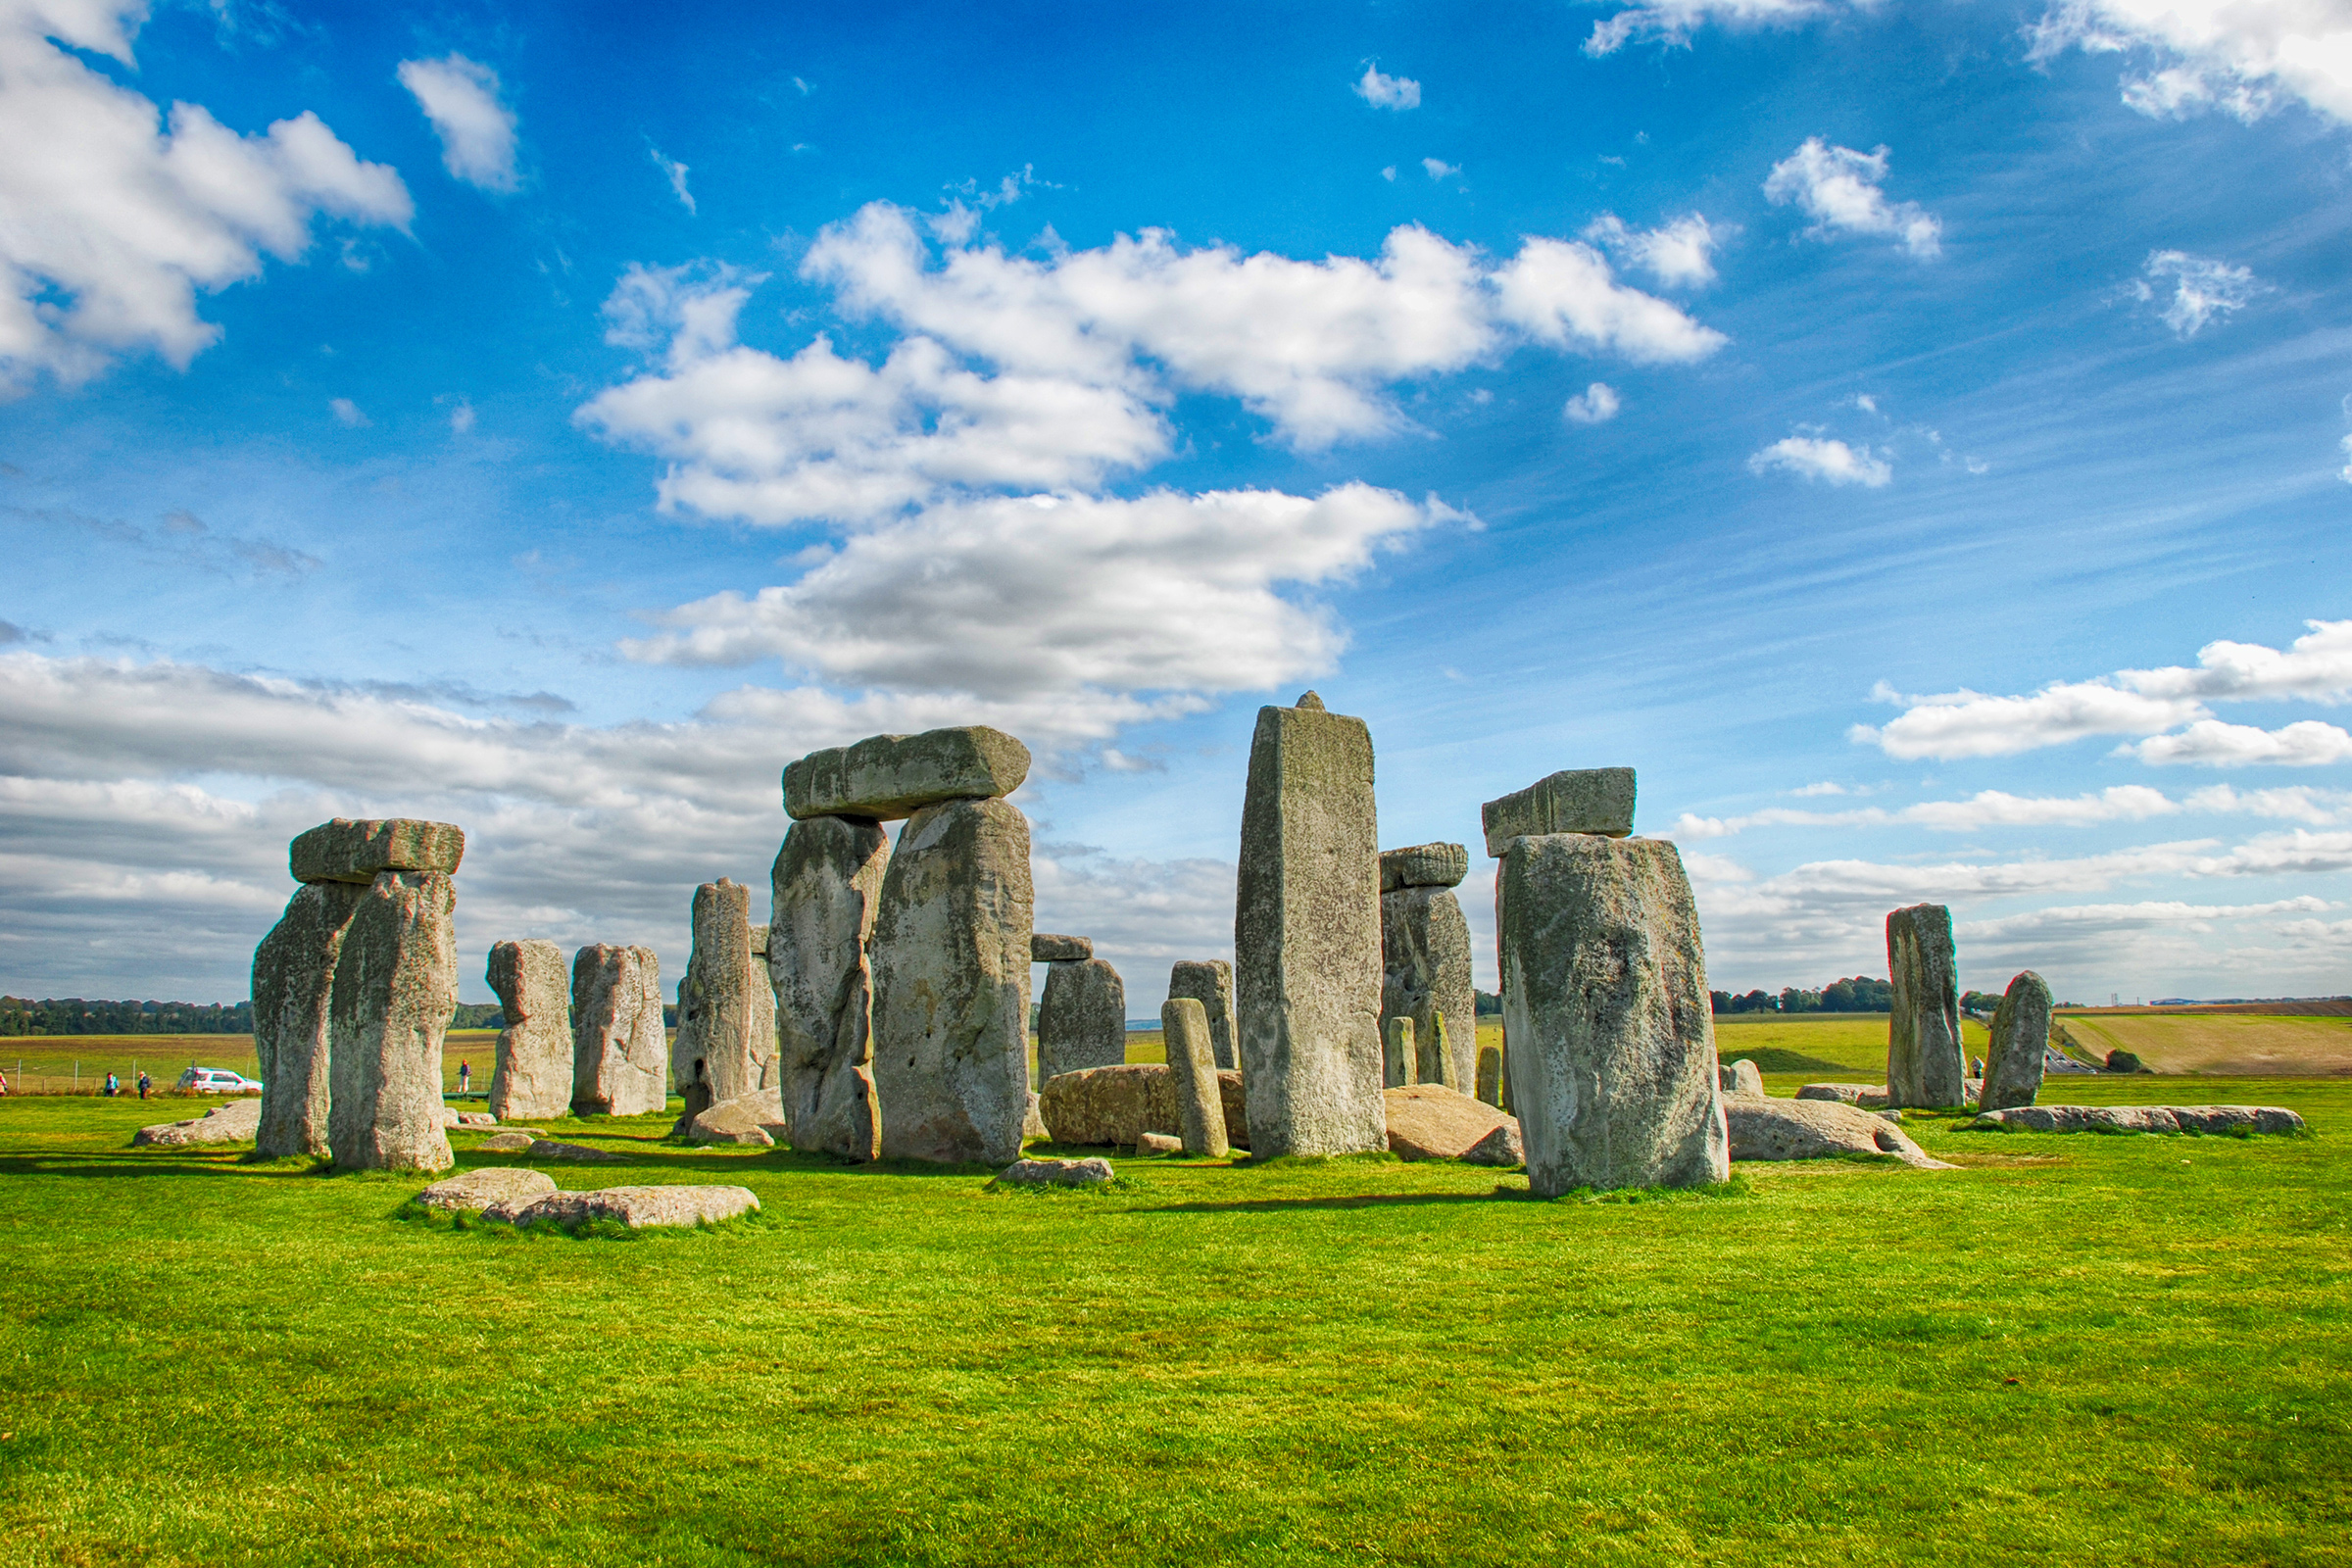 United Kingdom Stonehenge